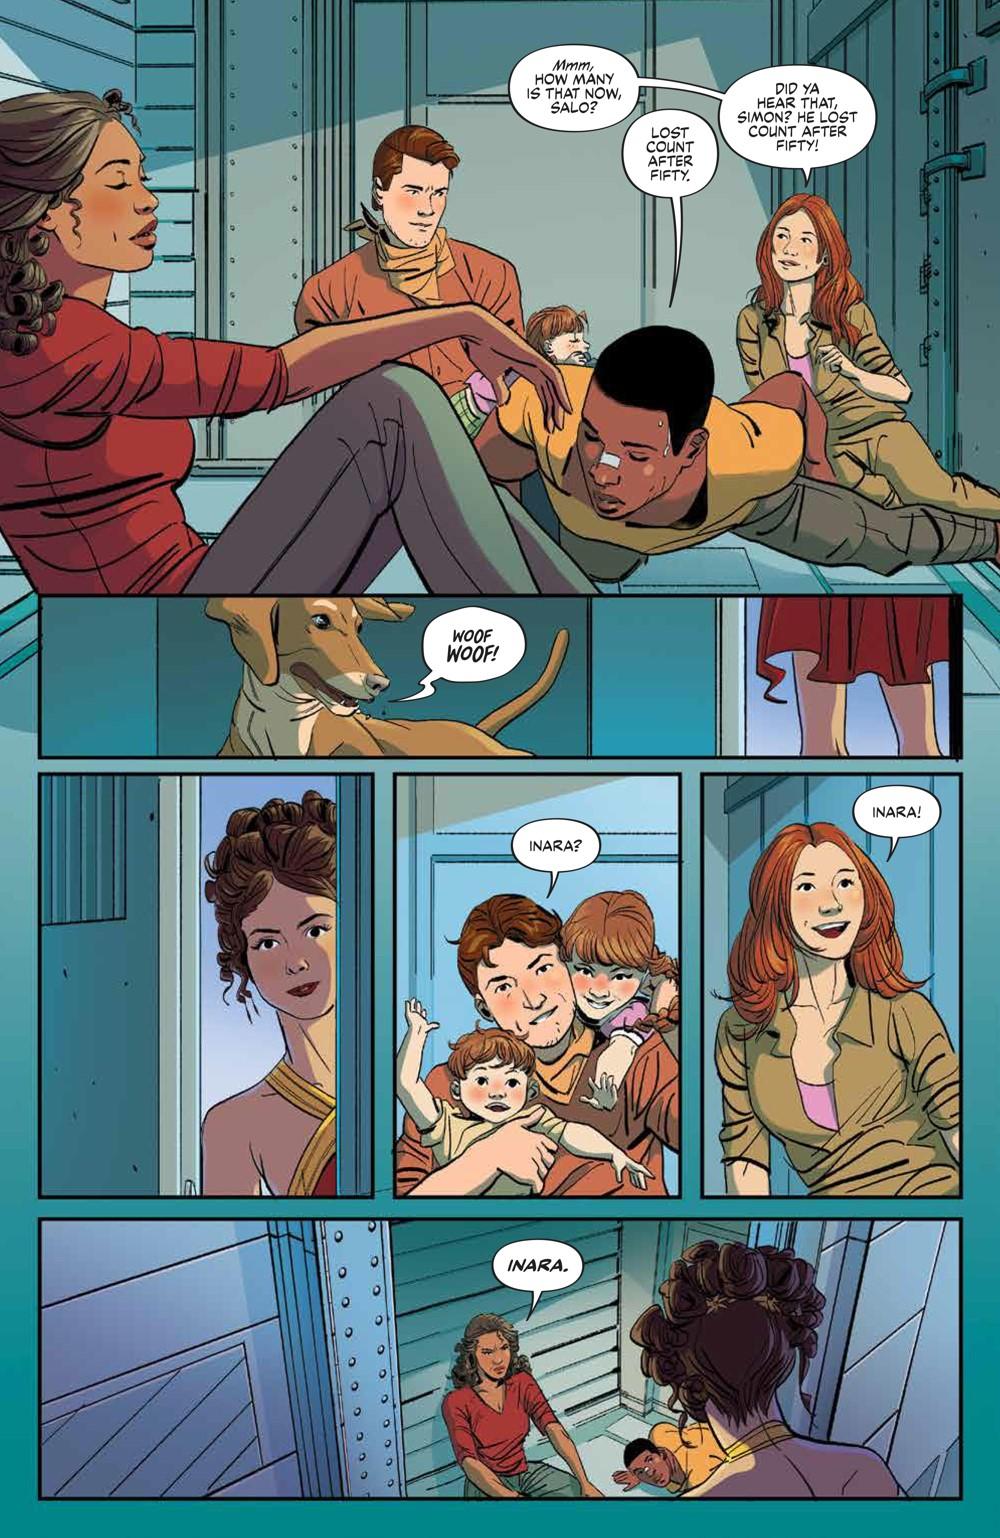 Firefly_BrandNewVerse_006_PRESS_7 ComicList Previews: FIREFLY BRAND NEW 'VERSE #6 (OF 6)